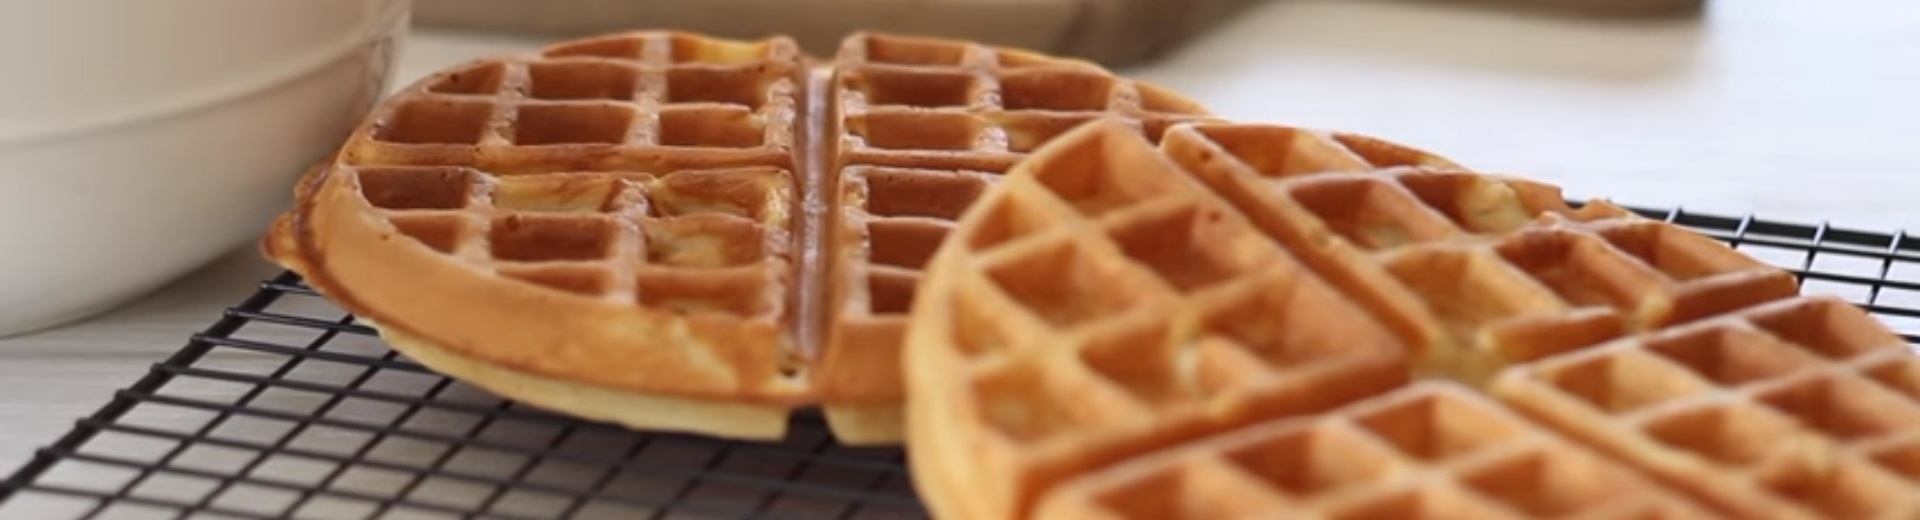 Waffle Maker Under $100